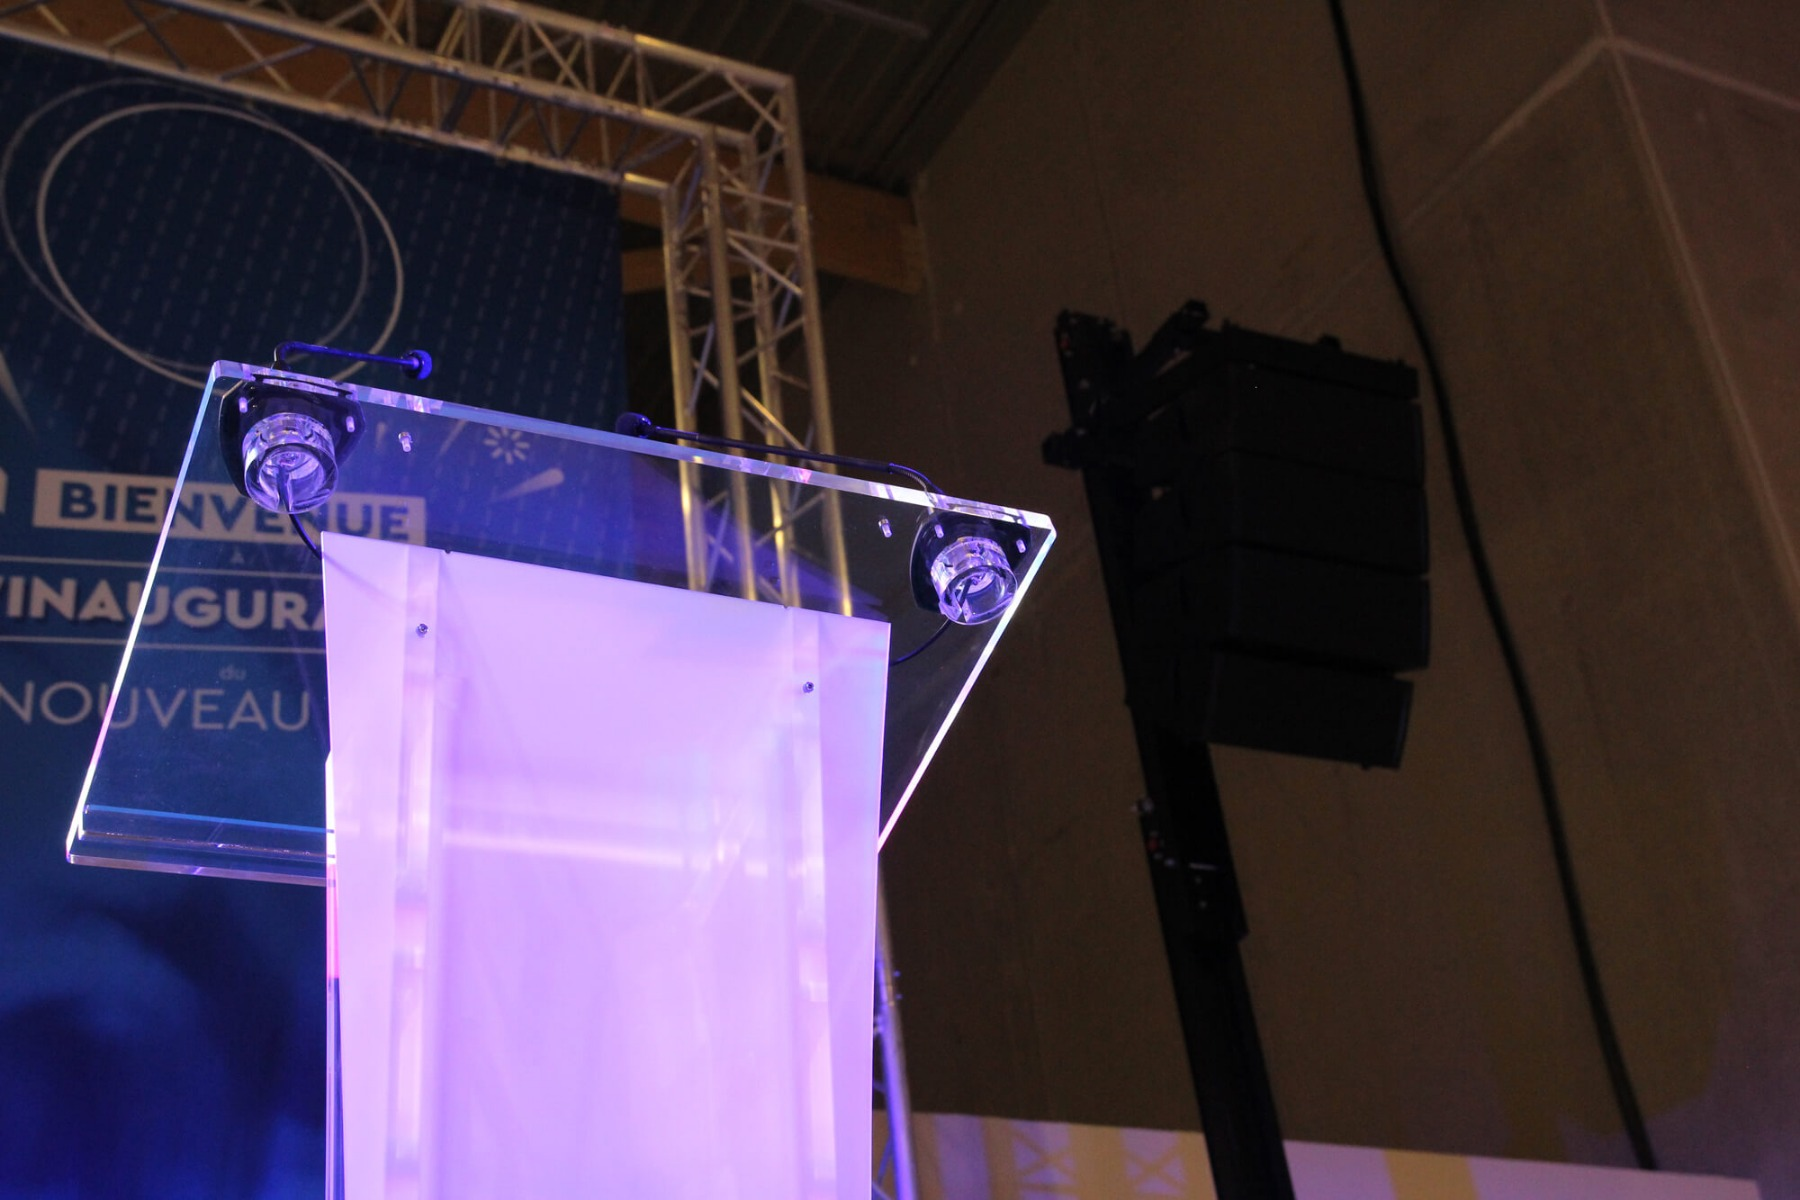 Discours inauguration avec système son Uniline Compact